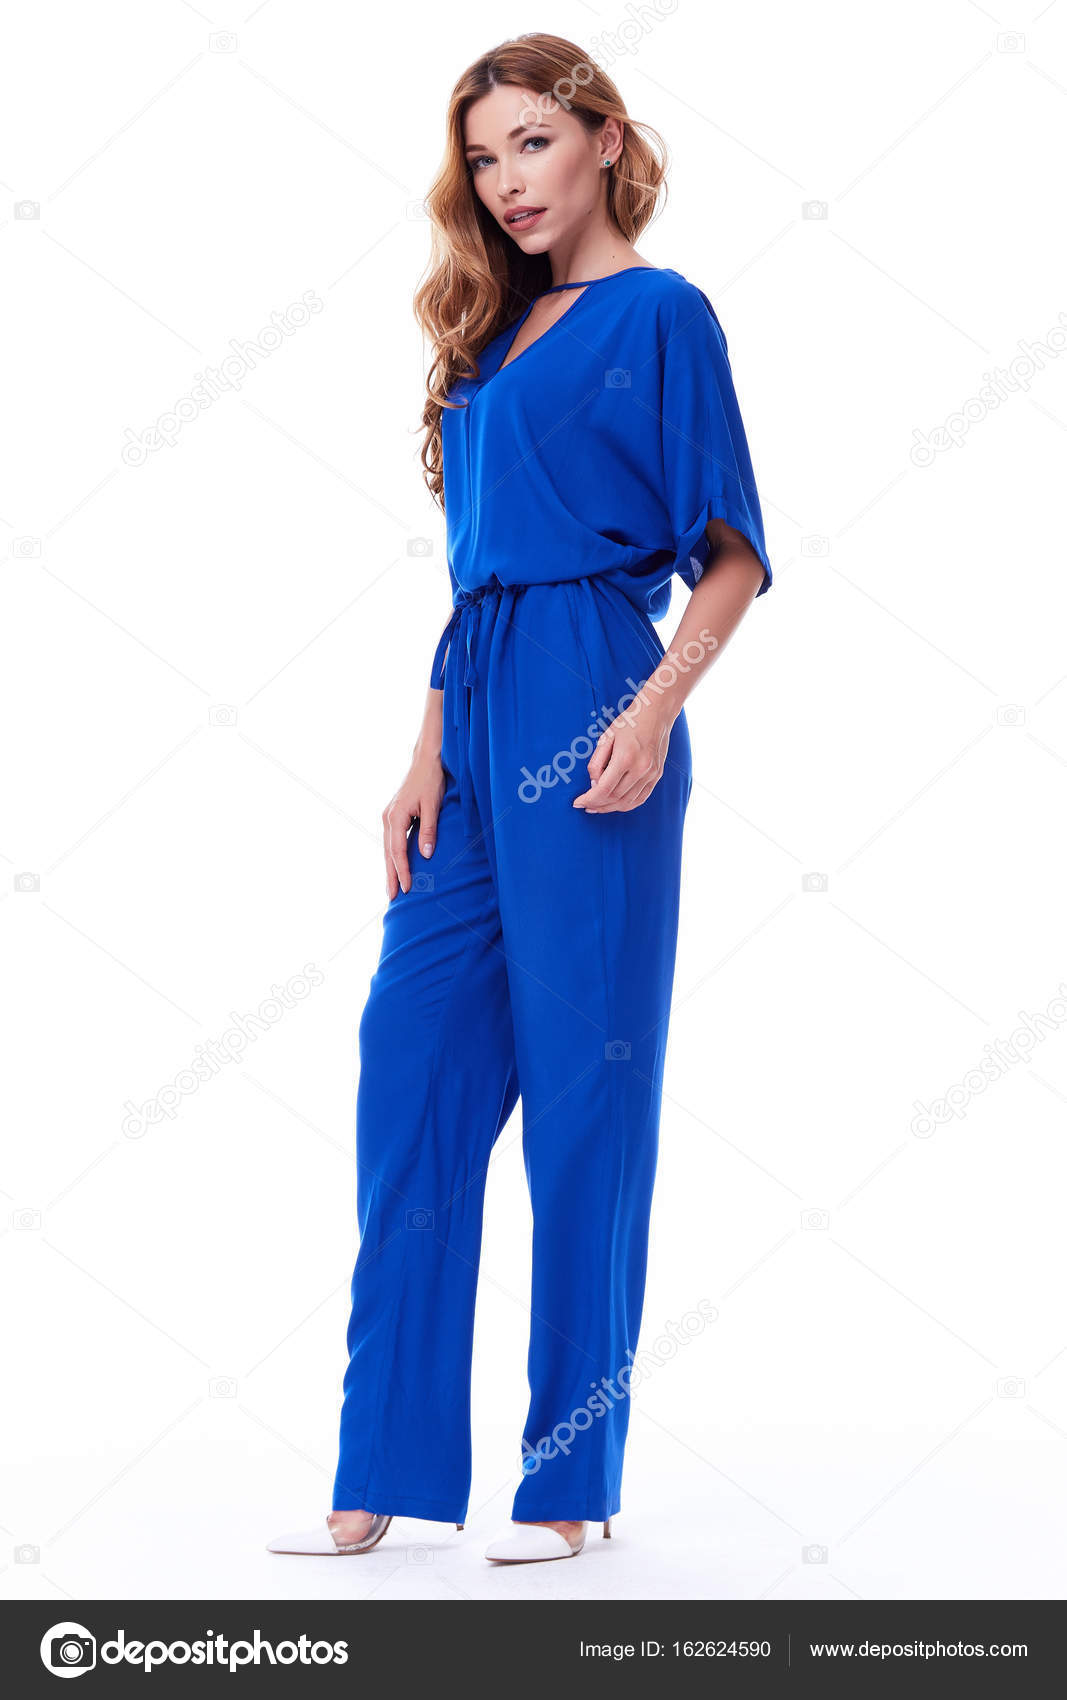 Glamour Kleding.Glamour Mode Stijl Catalogus Casual Kleding Voor Zakelijke Meetin